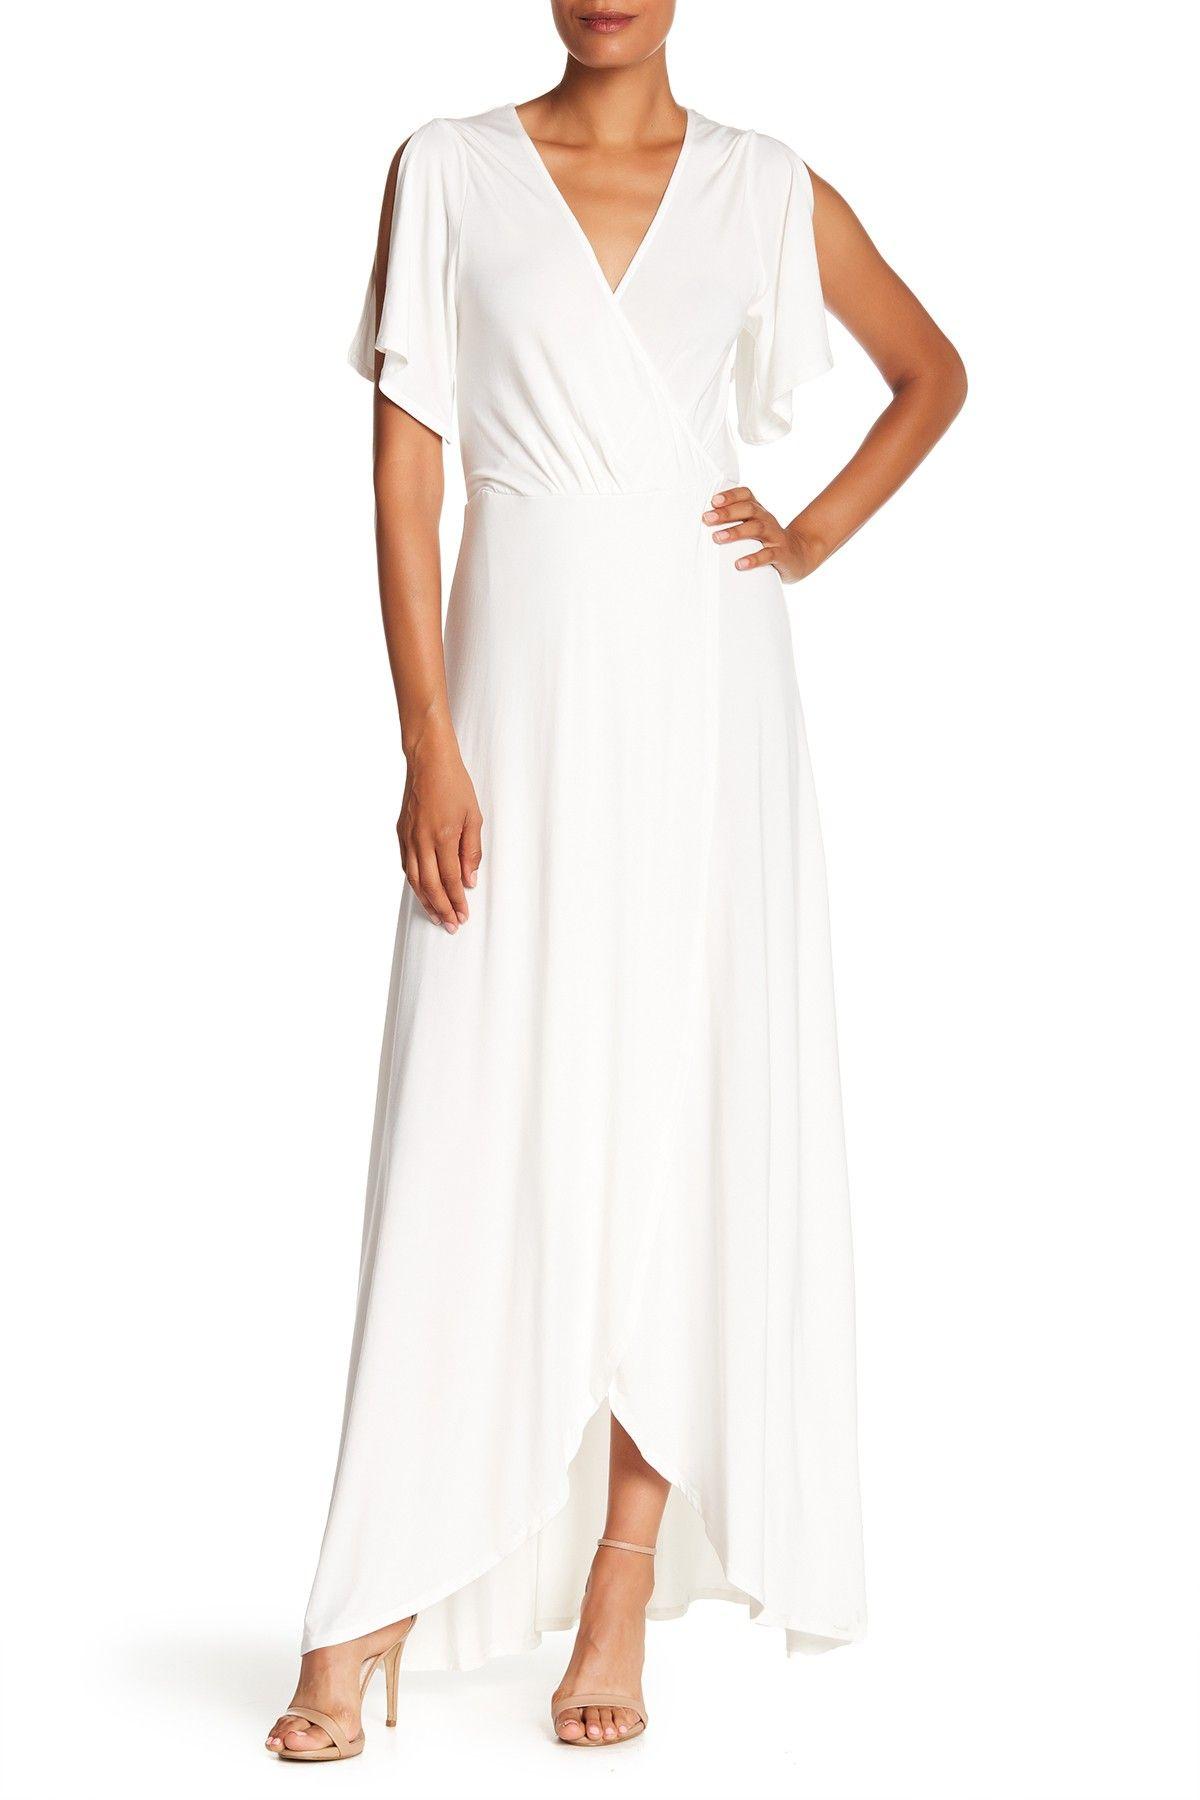 Tart Summer S End Maxi Dress Nordstrom Rack Maxi Dress Dresses Nordstrom Dresses [ 1800 x 1200 Pixel ]